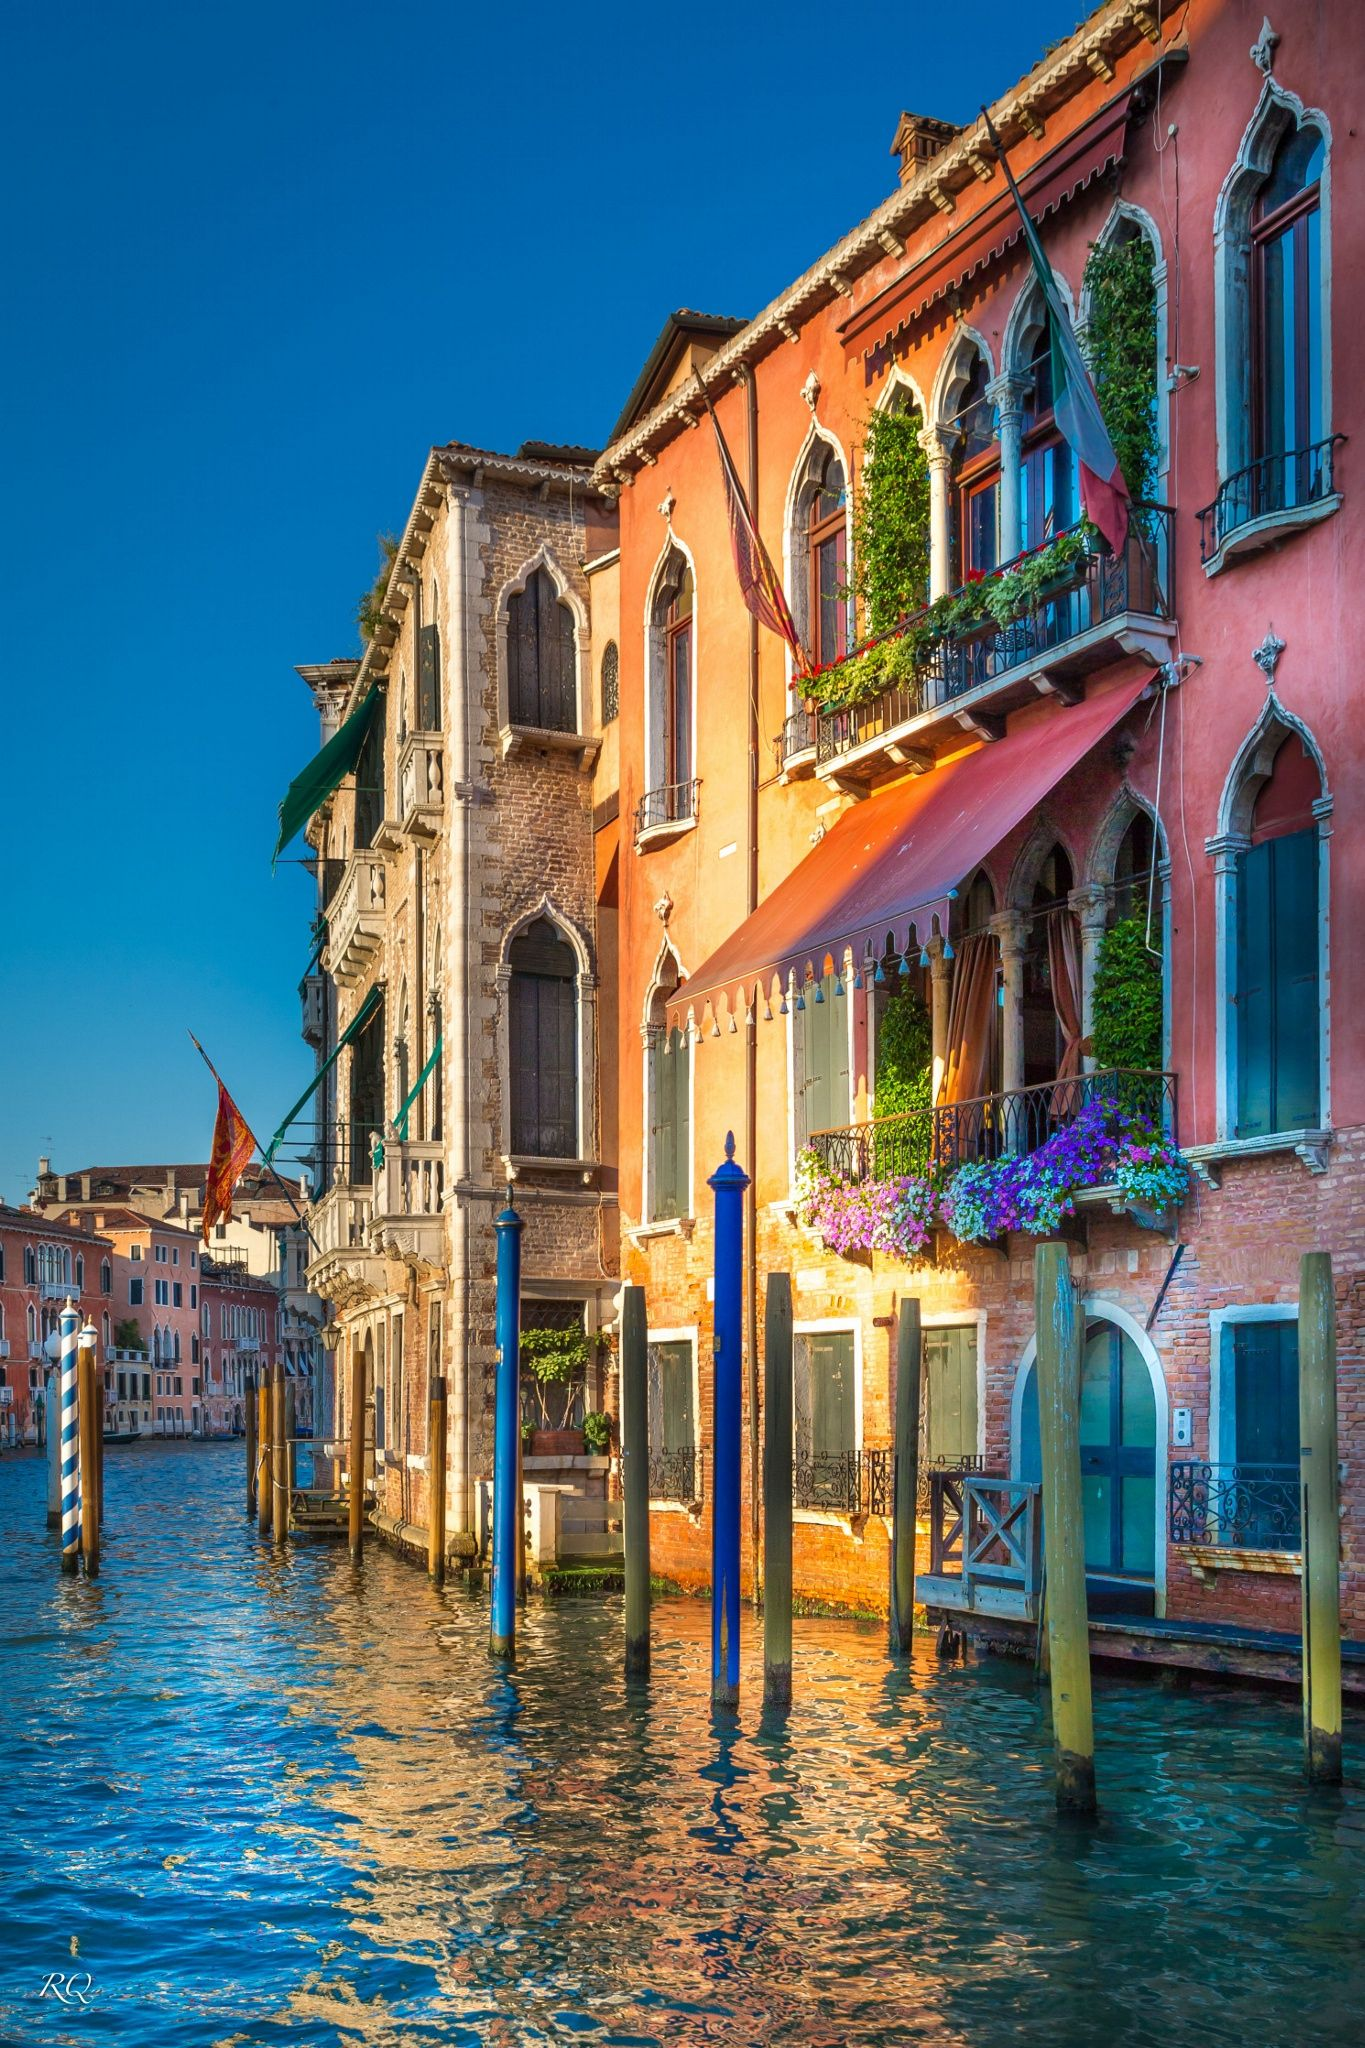 Venice by Riyaz Quraishi on 500px